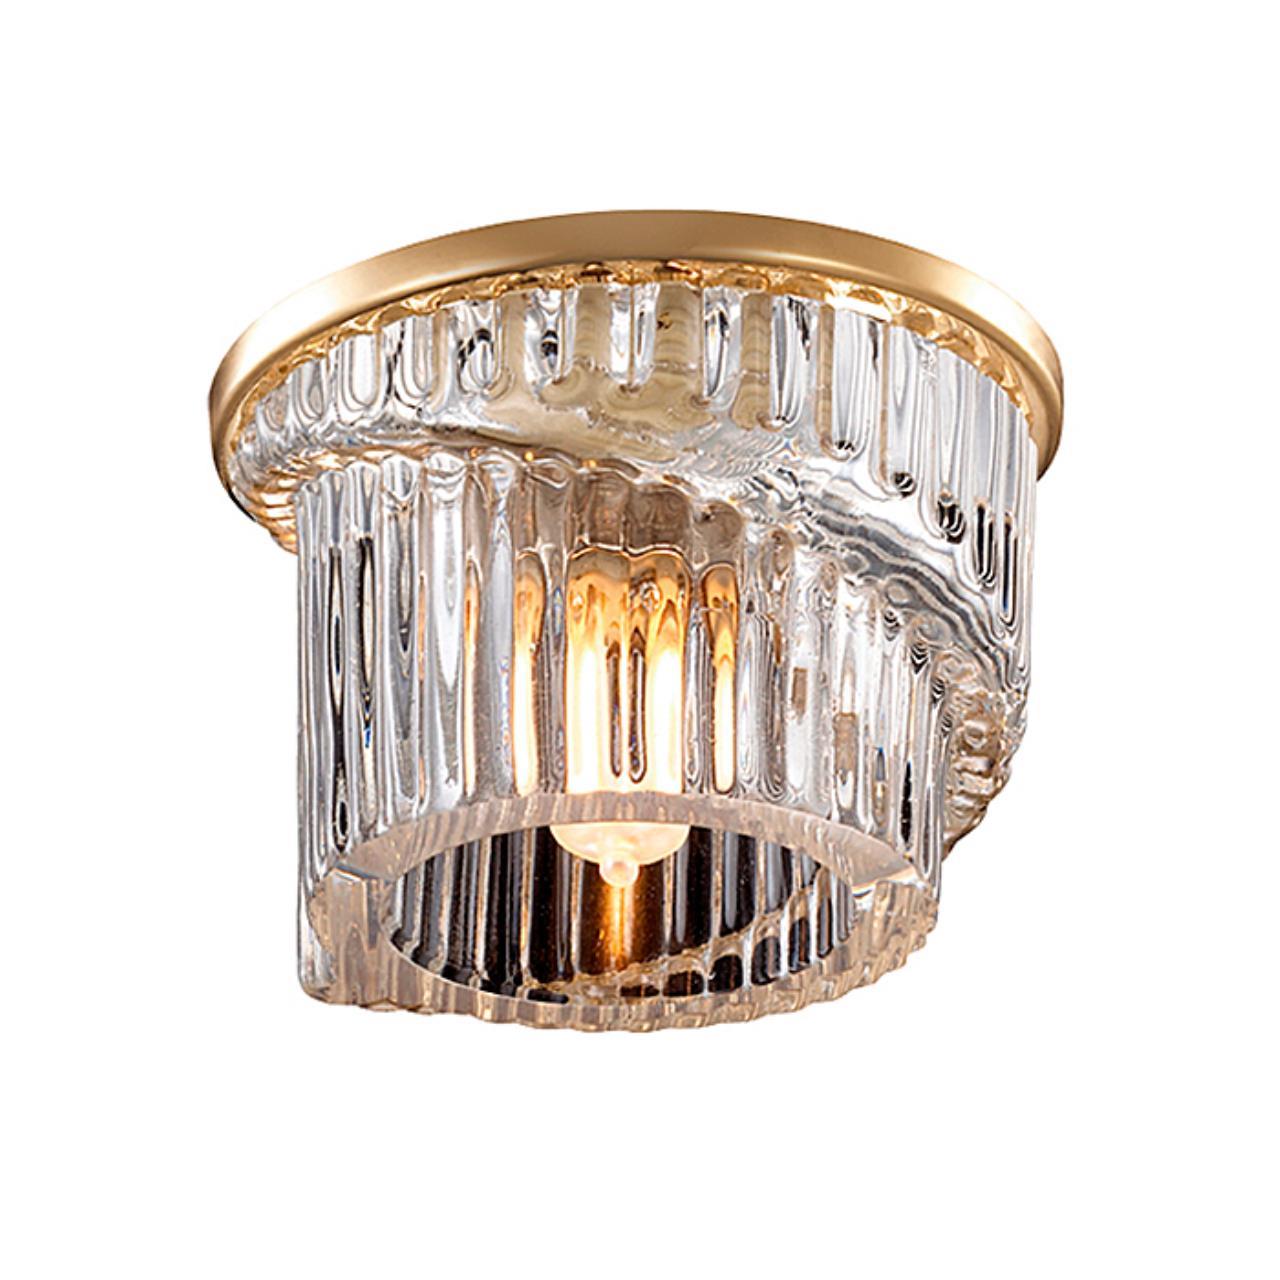 369901 SPOT NT14 125 золото Встраиваемый светильник IP20 G9 40W 220V DEW